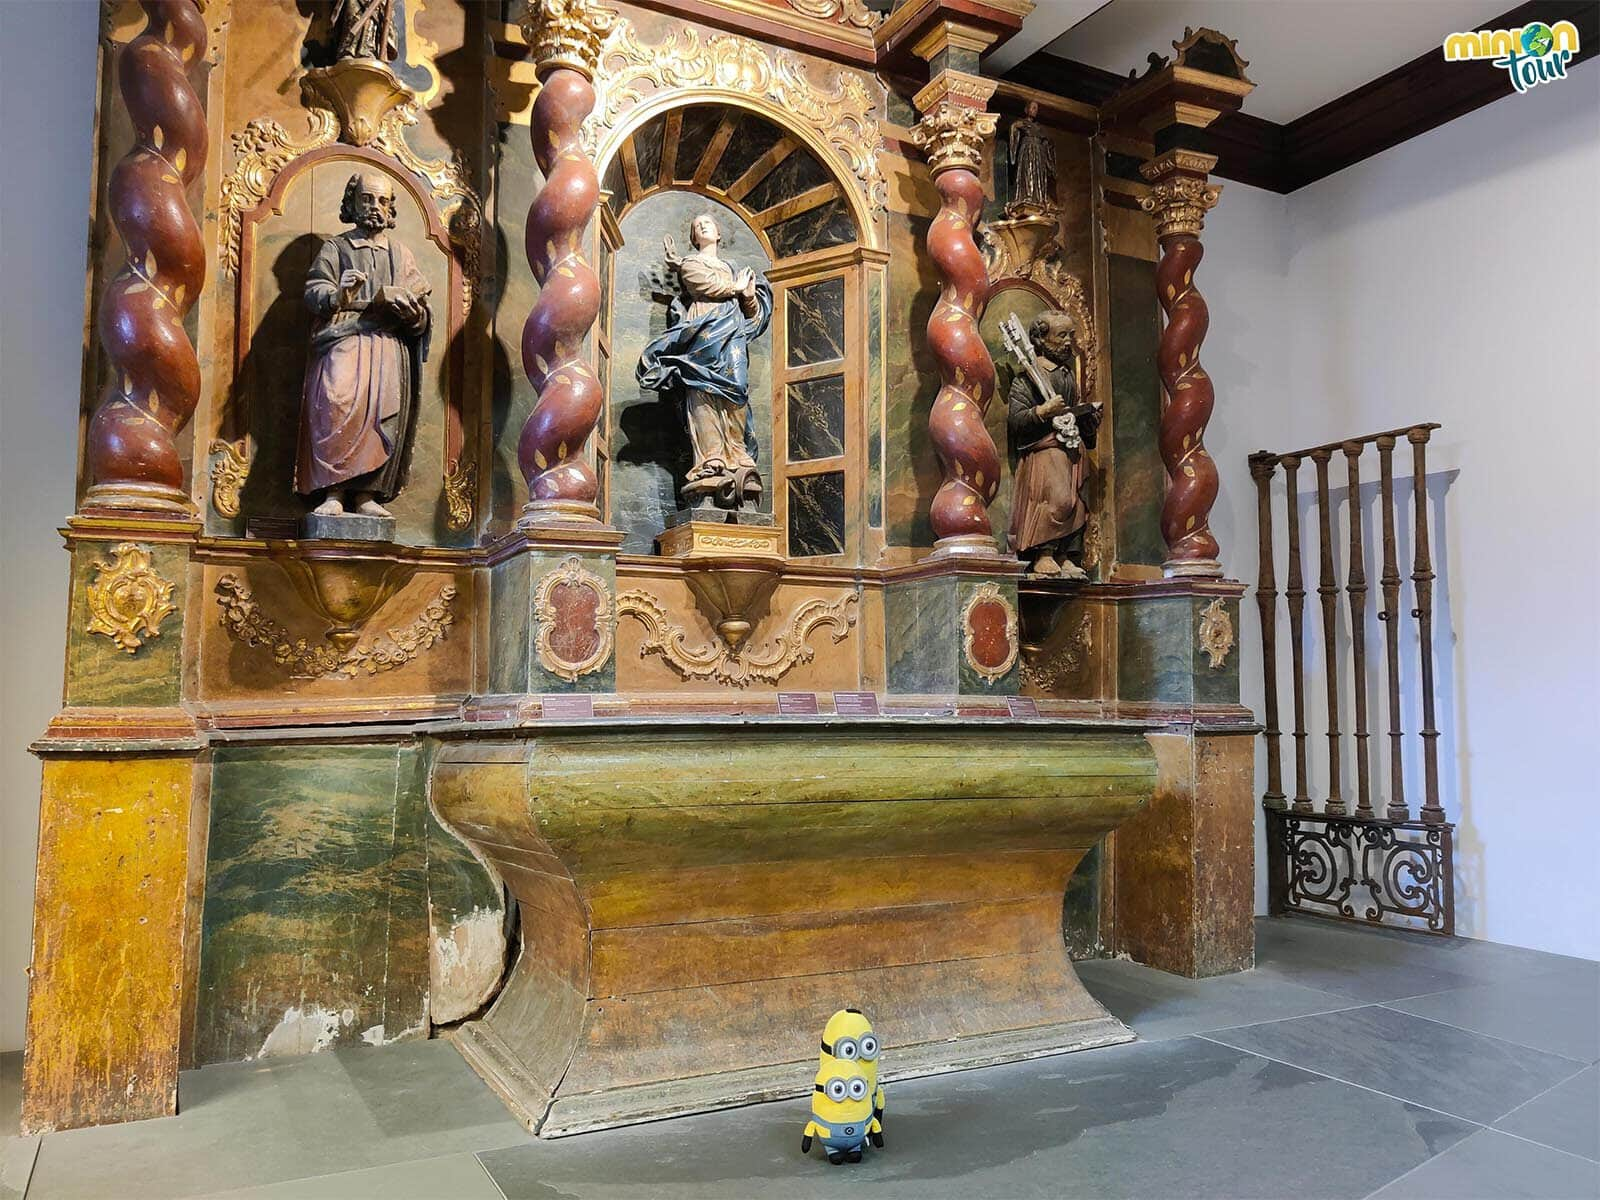 Retablo de la Capilla de San Ignacio de Loyola de la Catedral de Mondoñedo